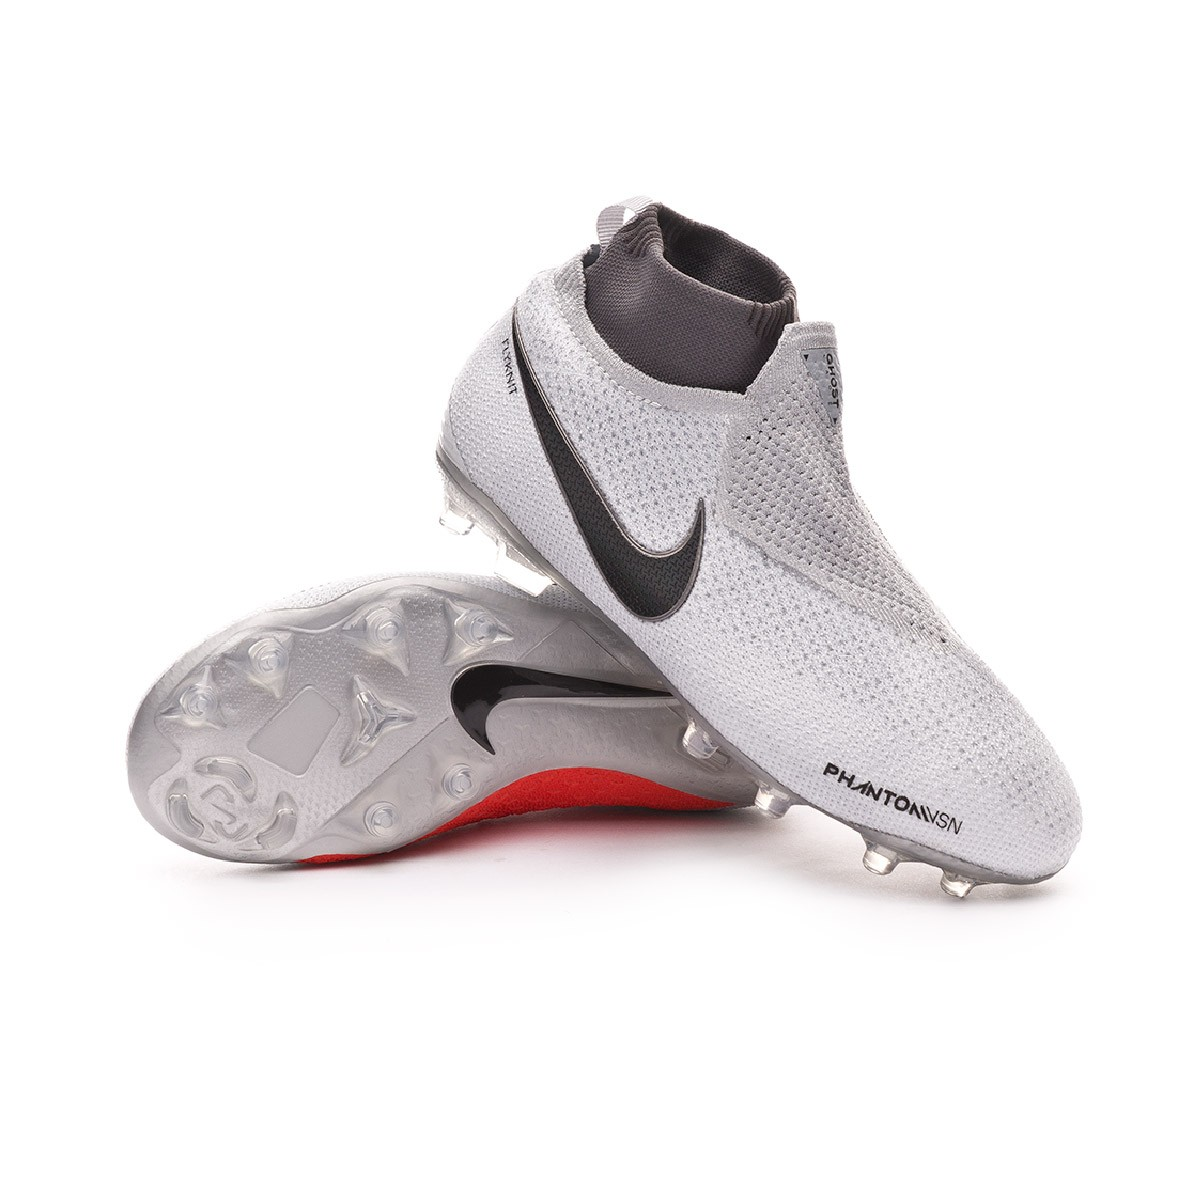 6d88e7f2d Football Boots Nike Kids Phantom Vision Elite DF MG Pure platinum-Black-Light  crimson-Dark grey - Tienda de fútbol Fútbol Emotion